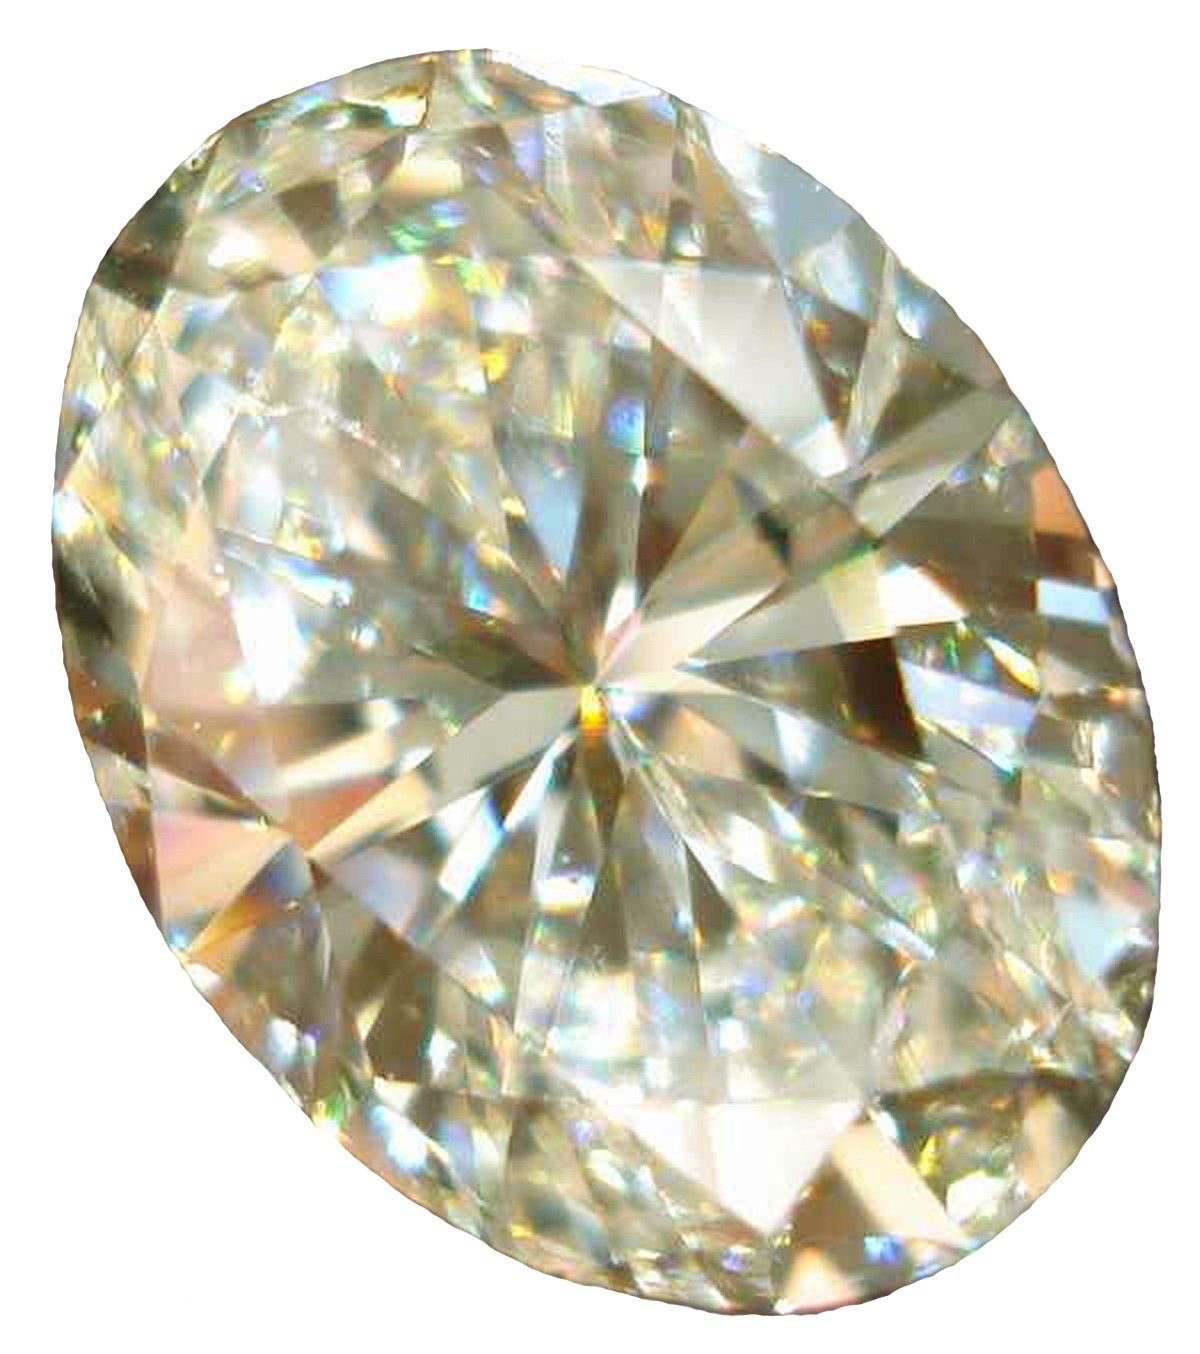 RINGJEWEL 6.66 CT VVS1 Loose Moissanite Oval-Cut Use 4 Pendant/Ring Off White Color Stone